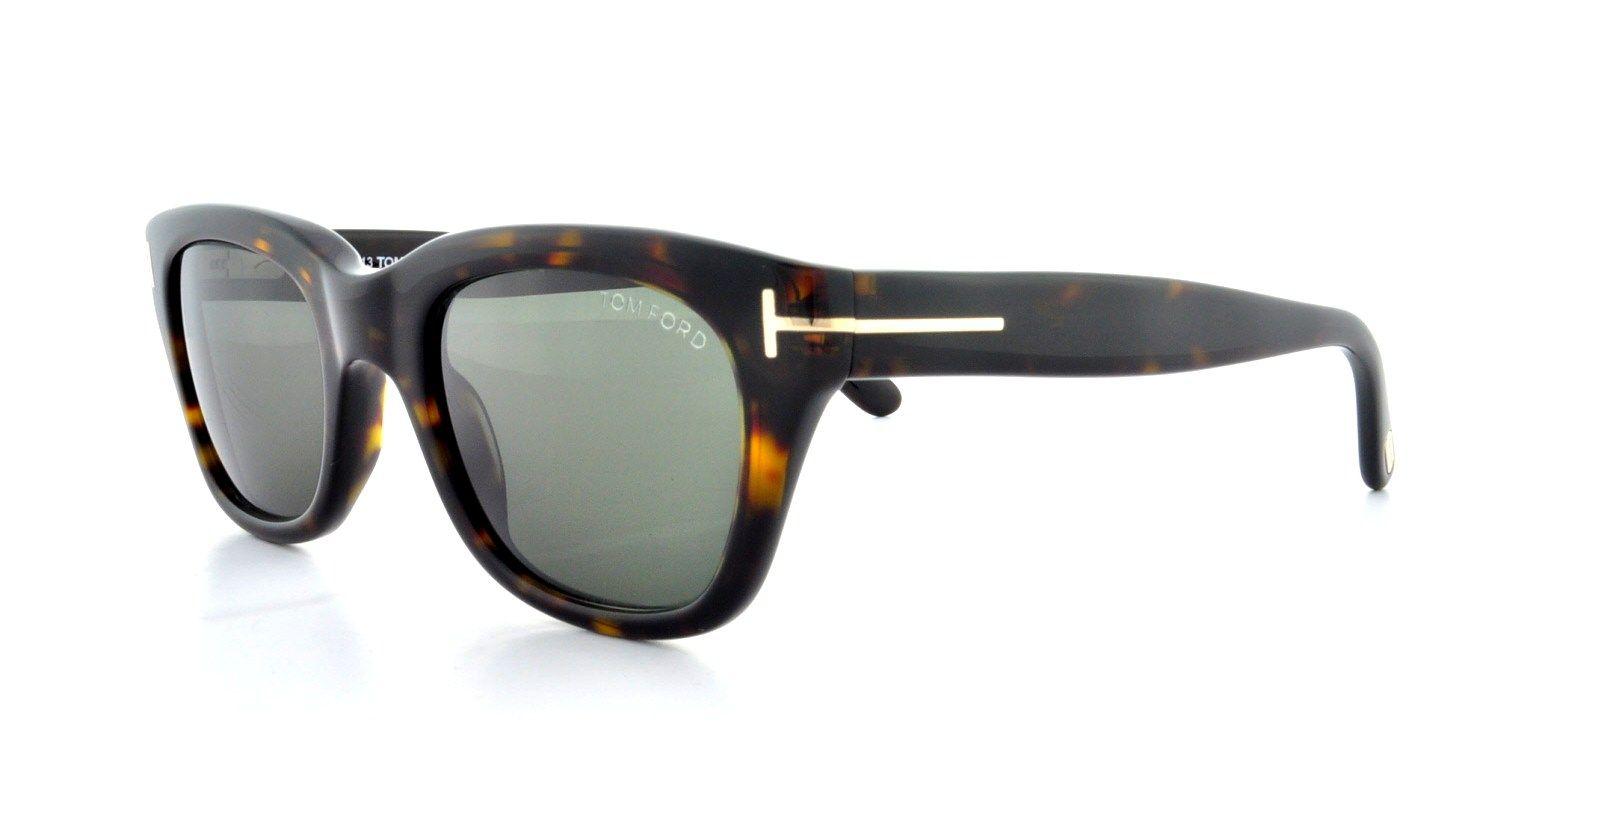 7afdd6abff68a Tom Ford Sunglasses FT0237